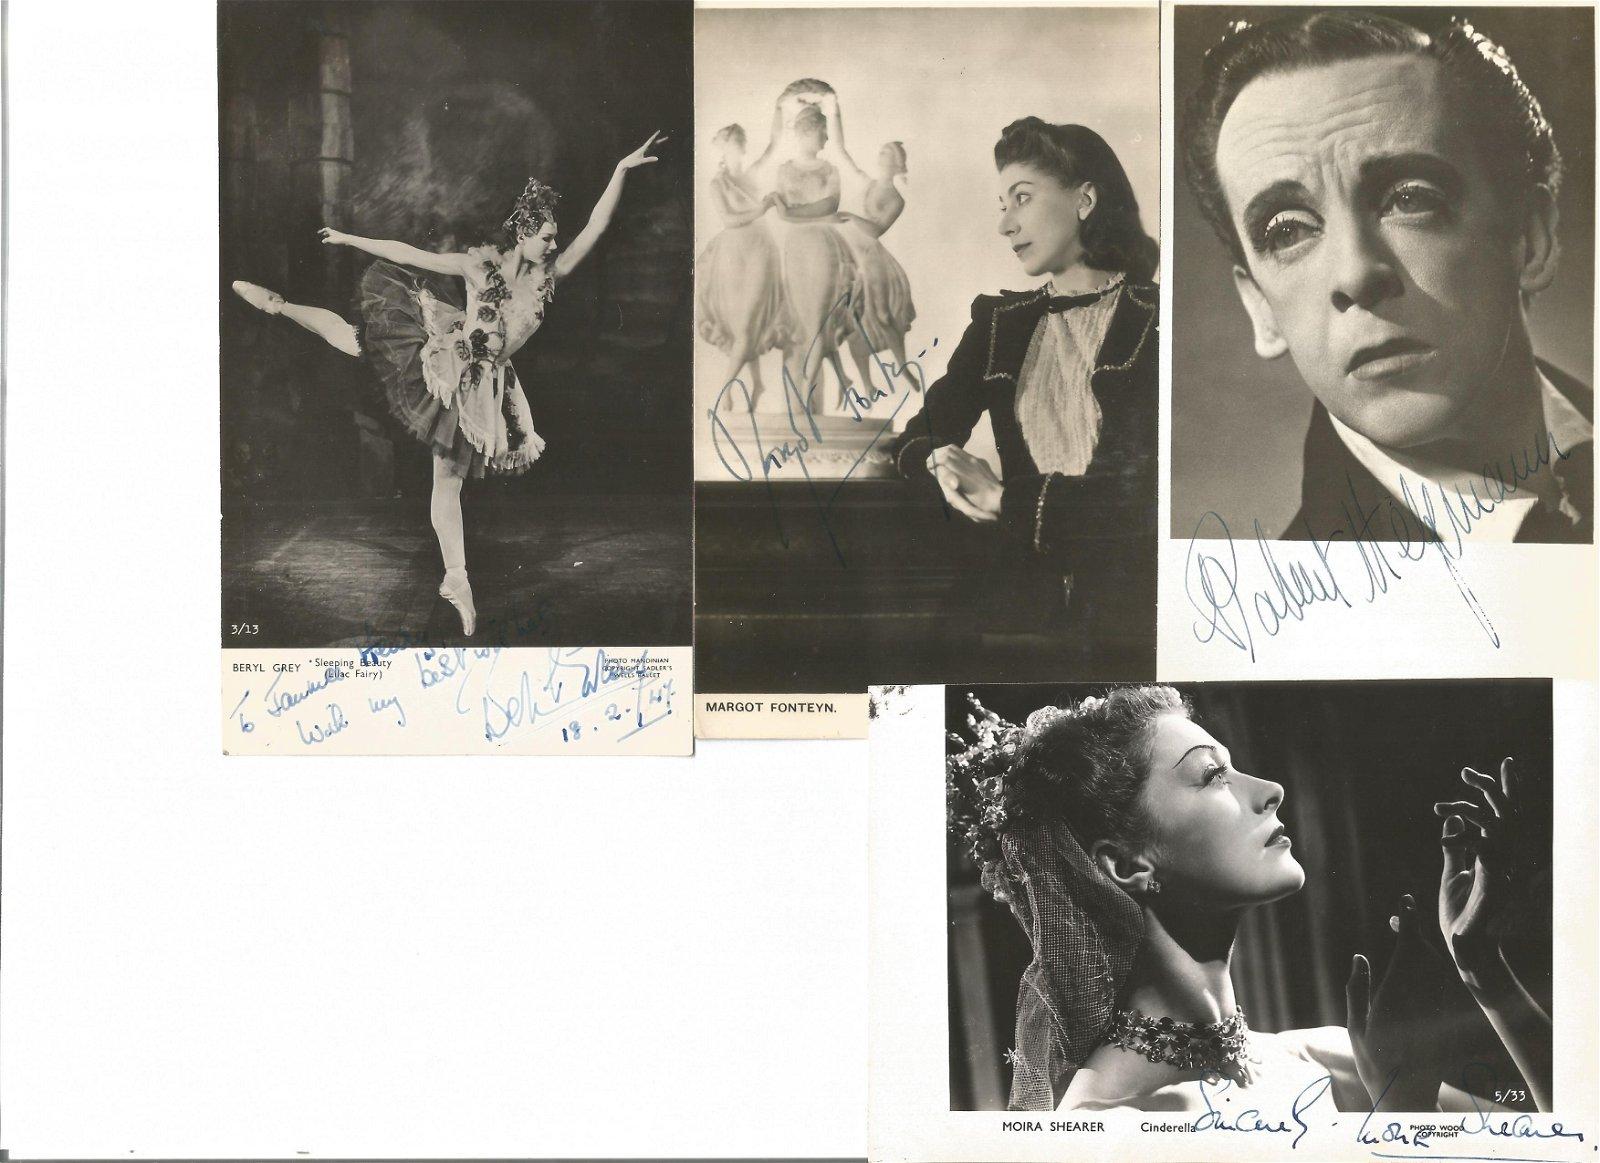 Douglas Fairbanks Jnr signed 6 x 4 vintage photo. Good